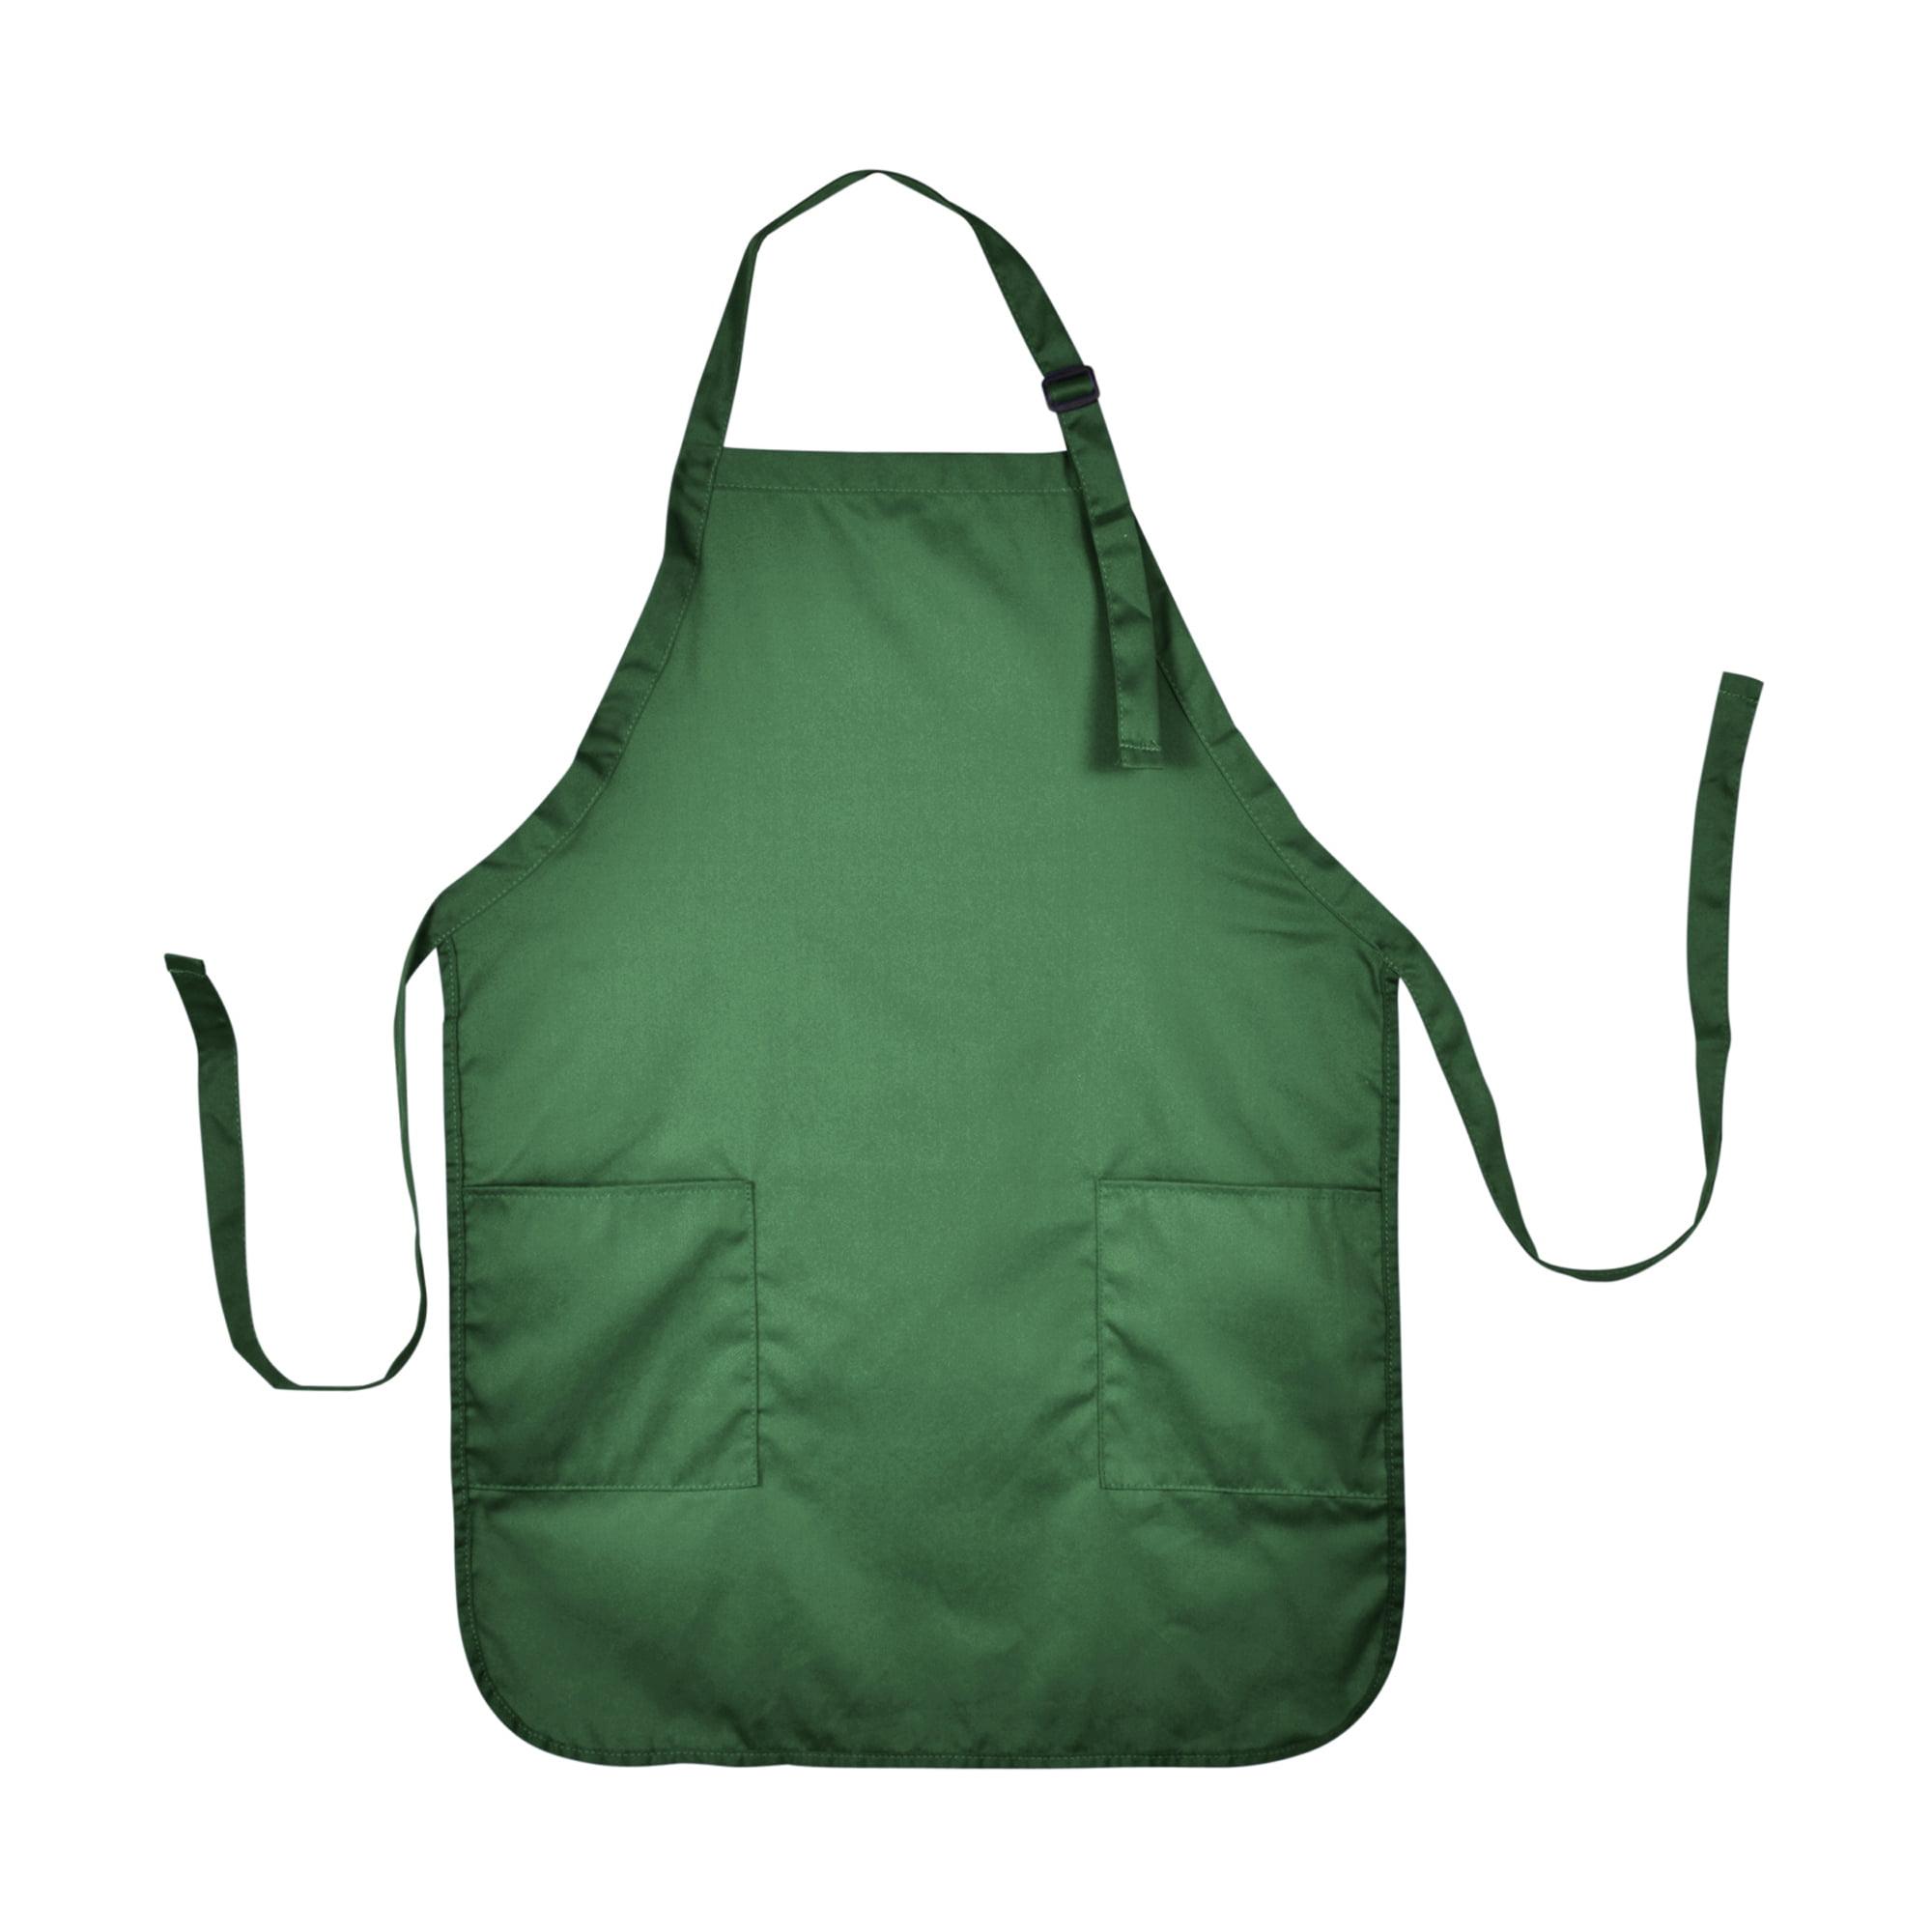 DALIX Apron Commercial Restaurant Home Bib Spun Poly Cotton Kitchen Aprons (2 Pockets) in Black